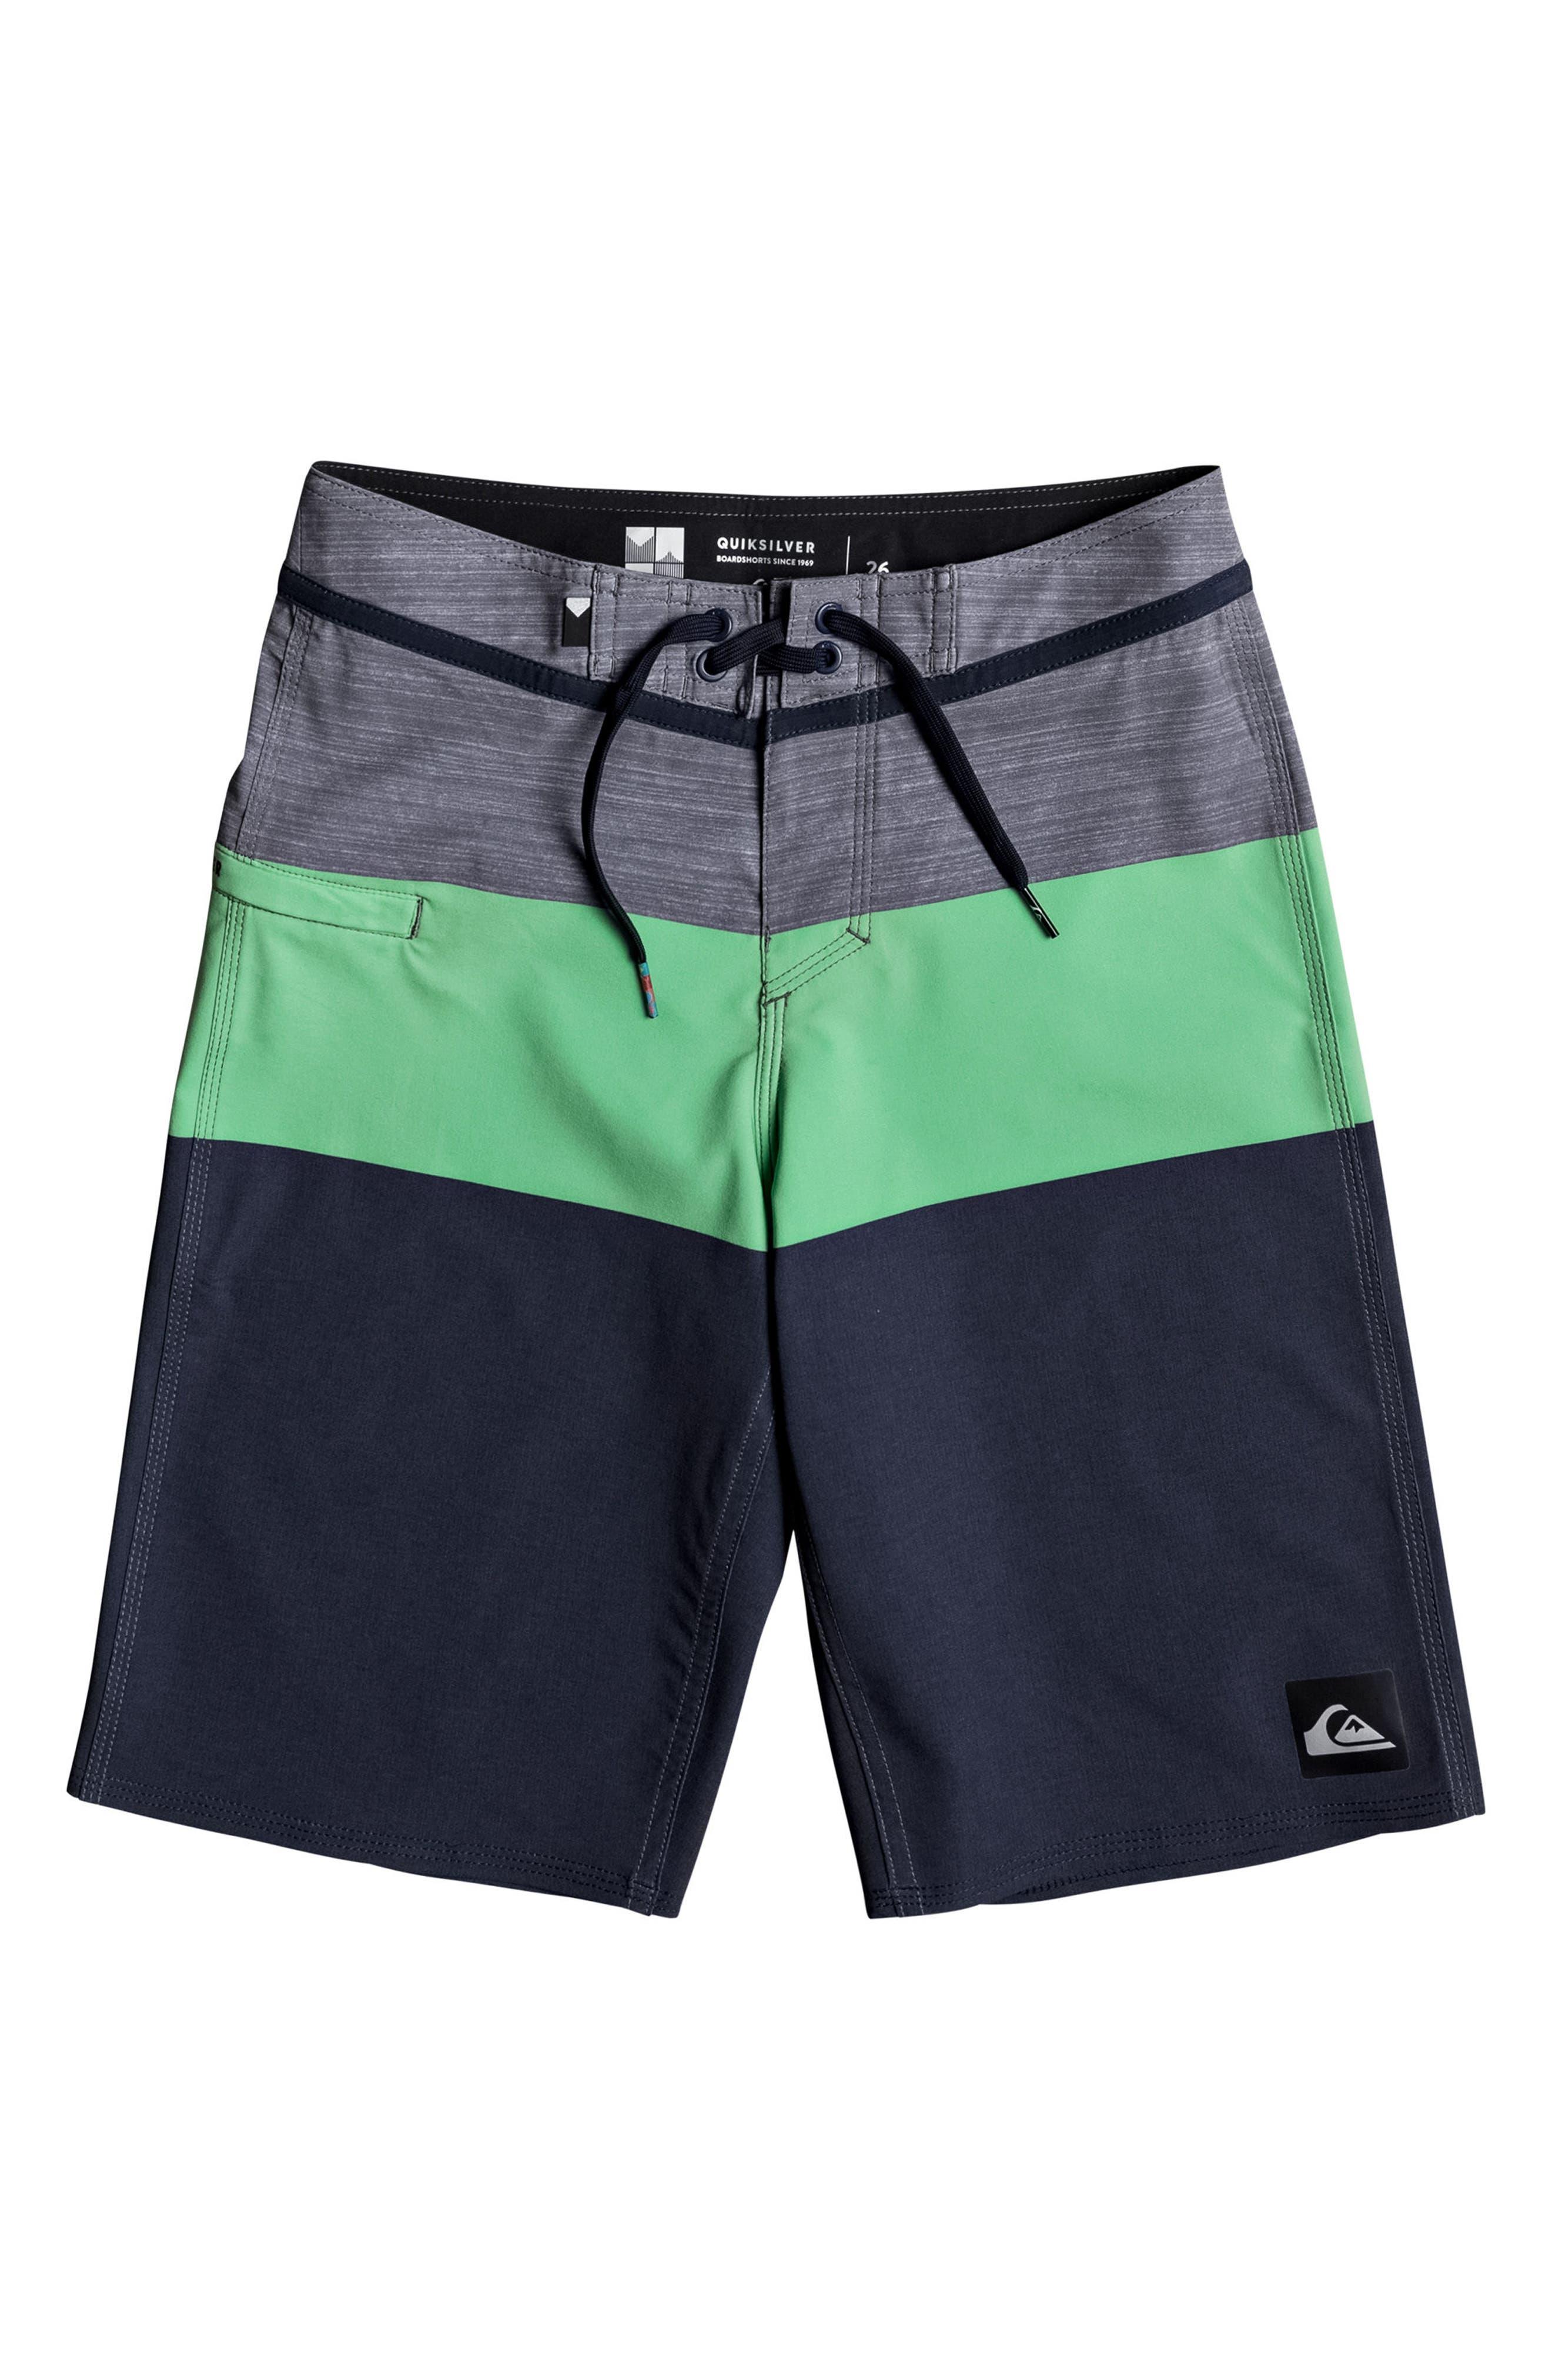 Quiksilver Everyday Blocked Vee Board Shorts (Big Boys)